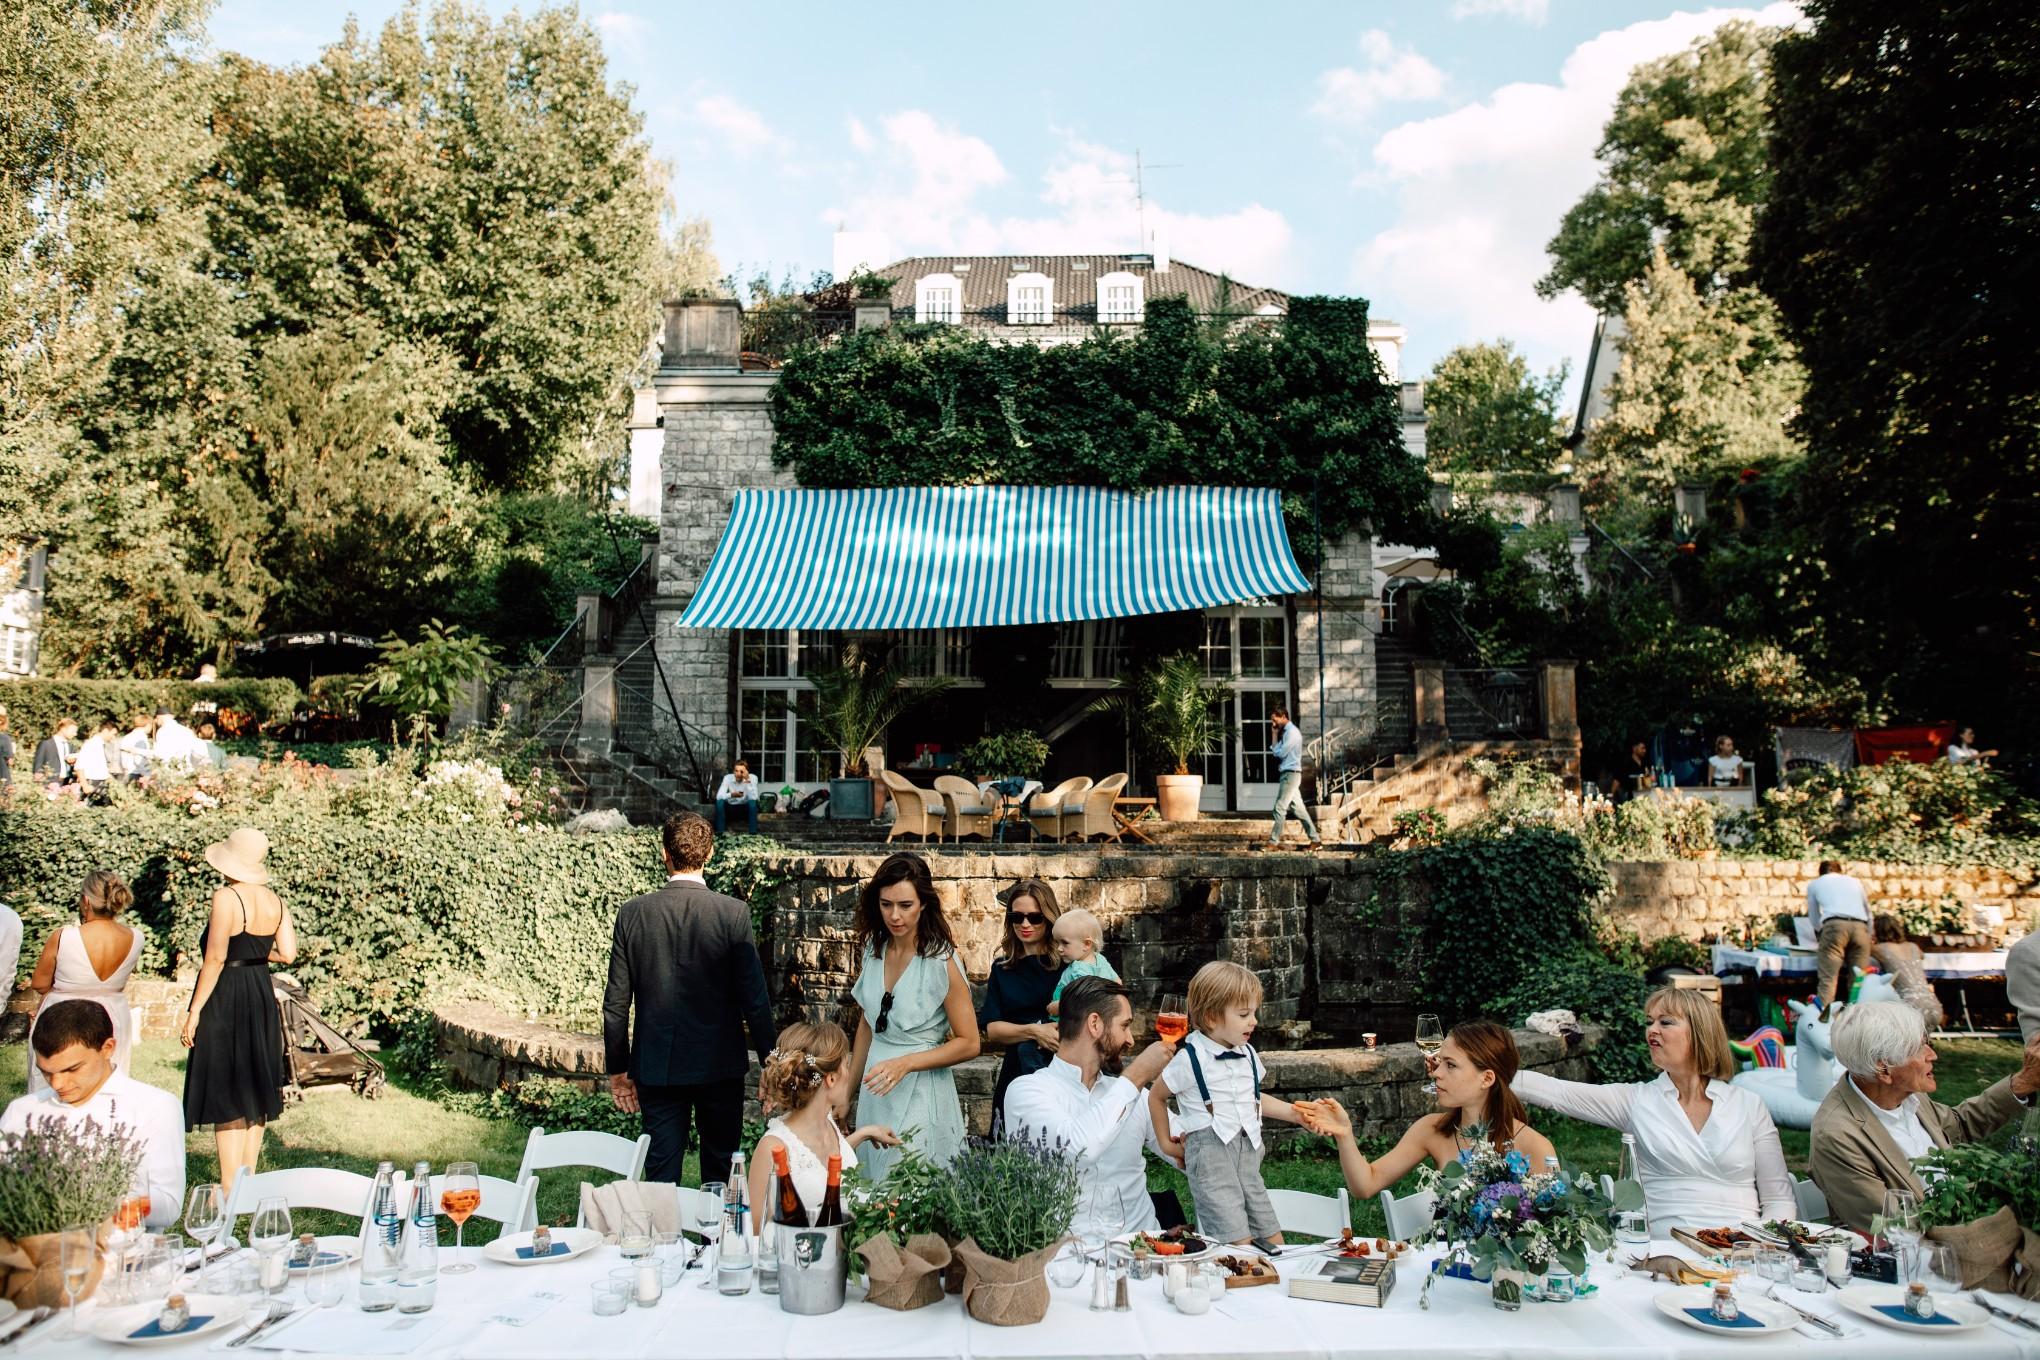 Berlin-Wannsee-Pia-Anna-Christian-Wedding-Photography-ST-65.jpg